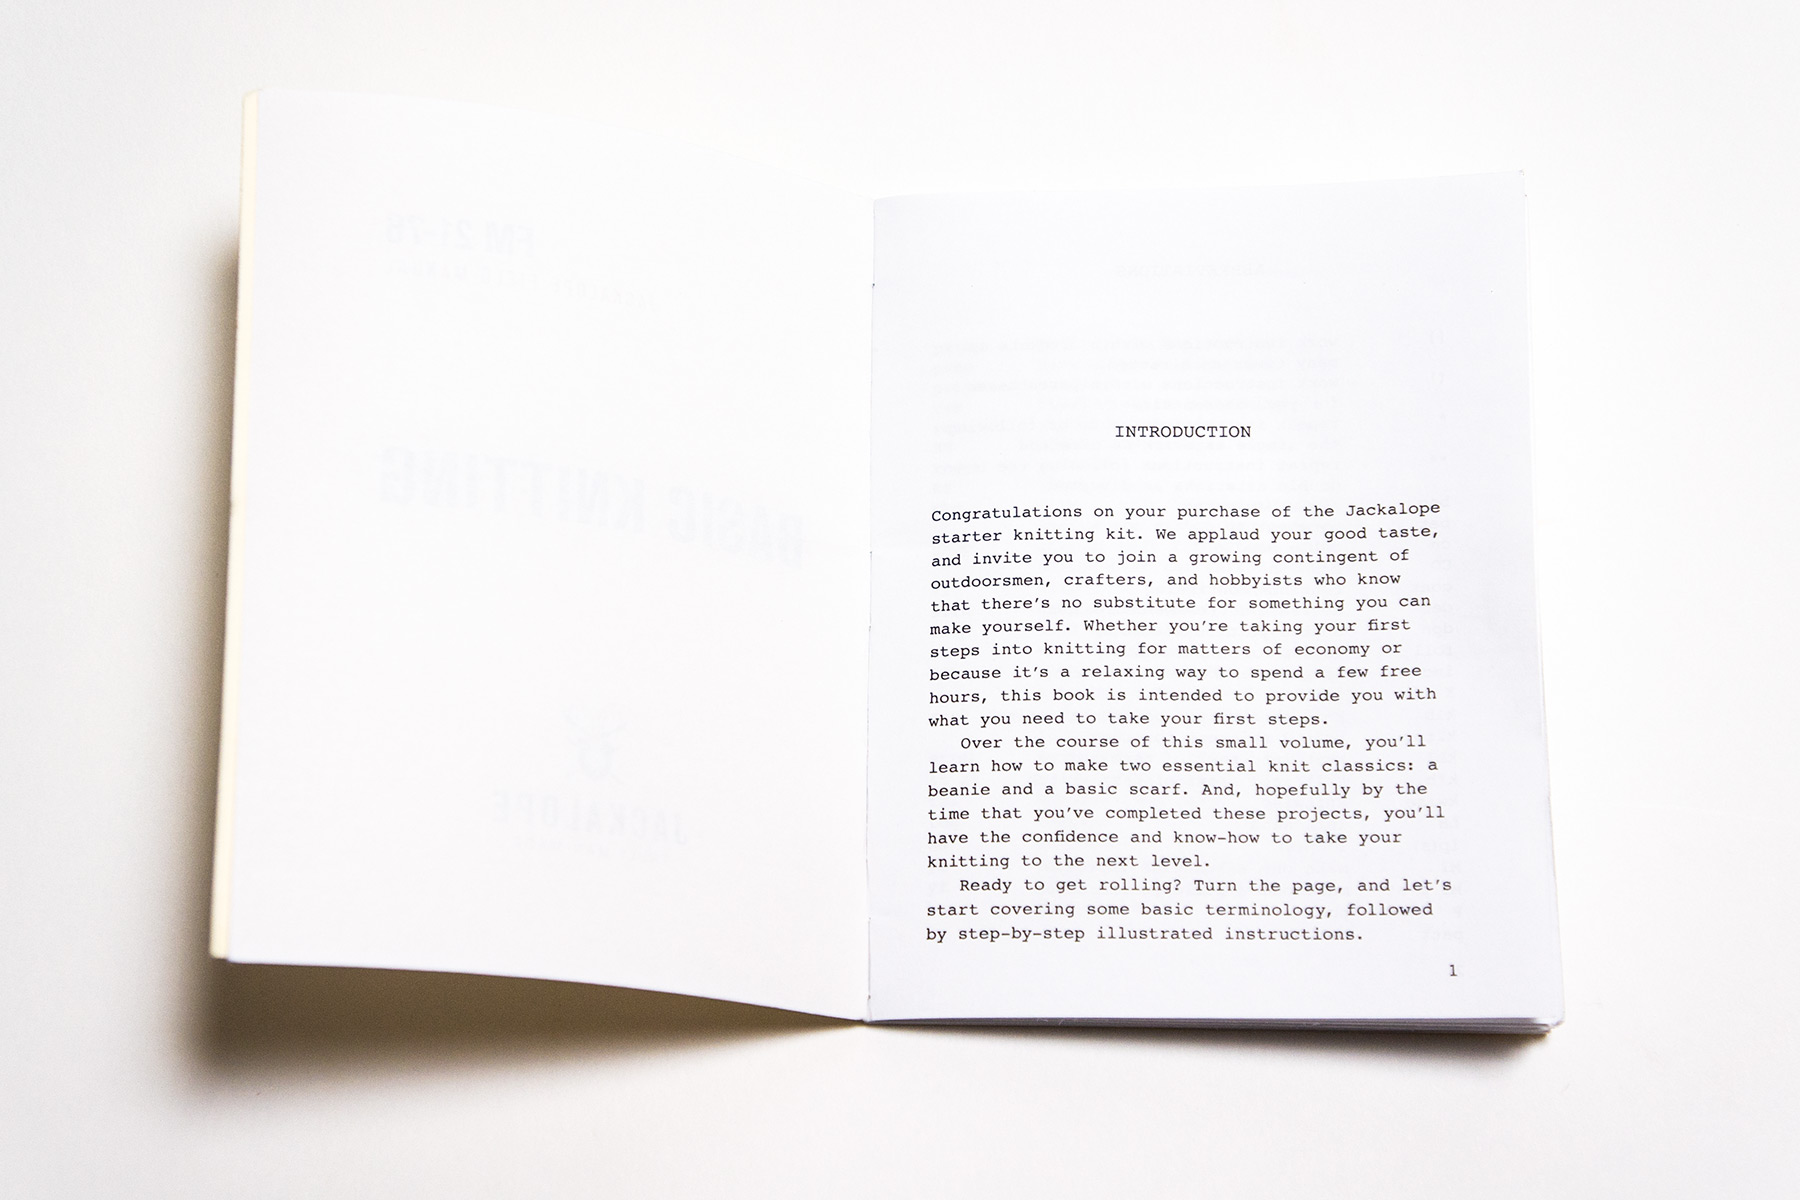 booklet_intro.jpg